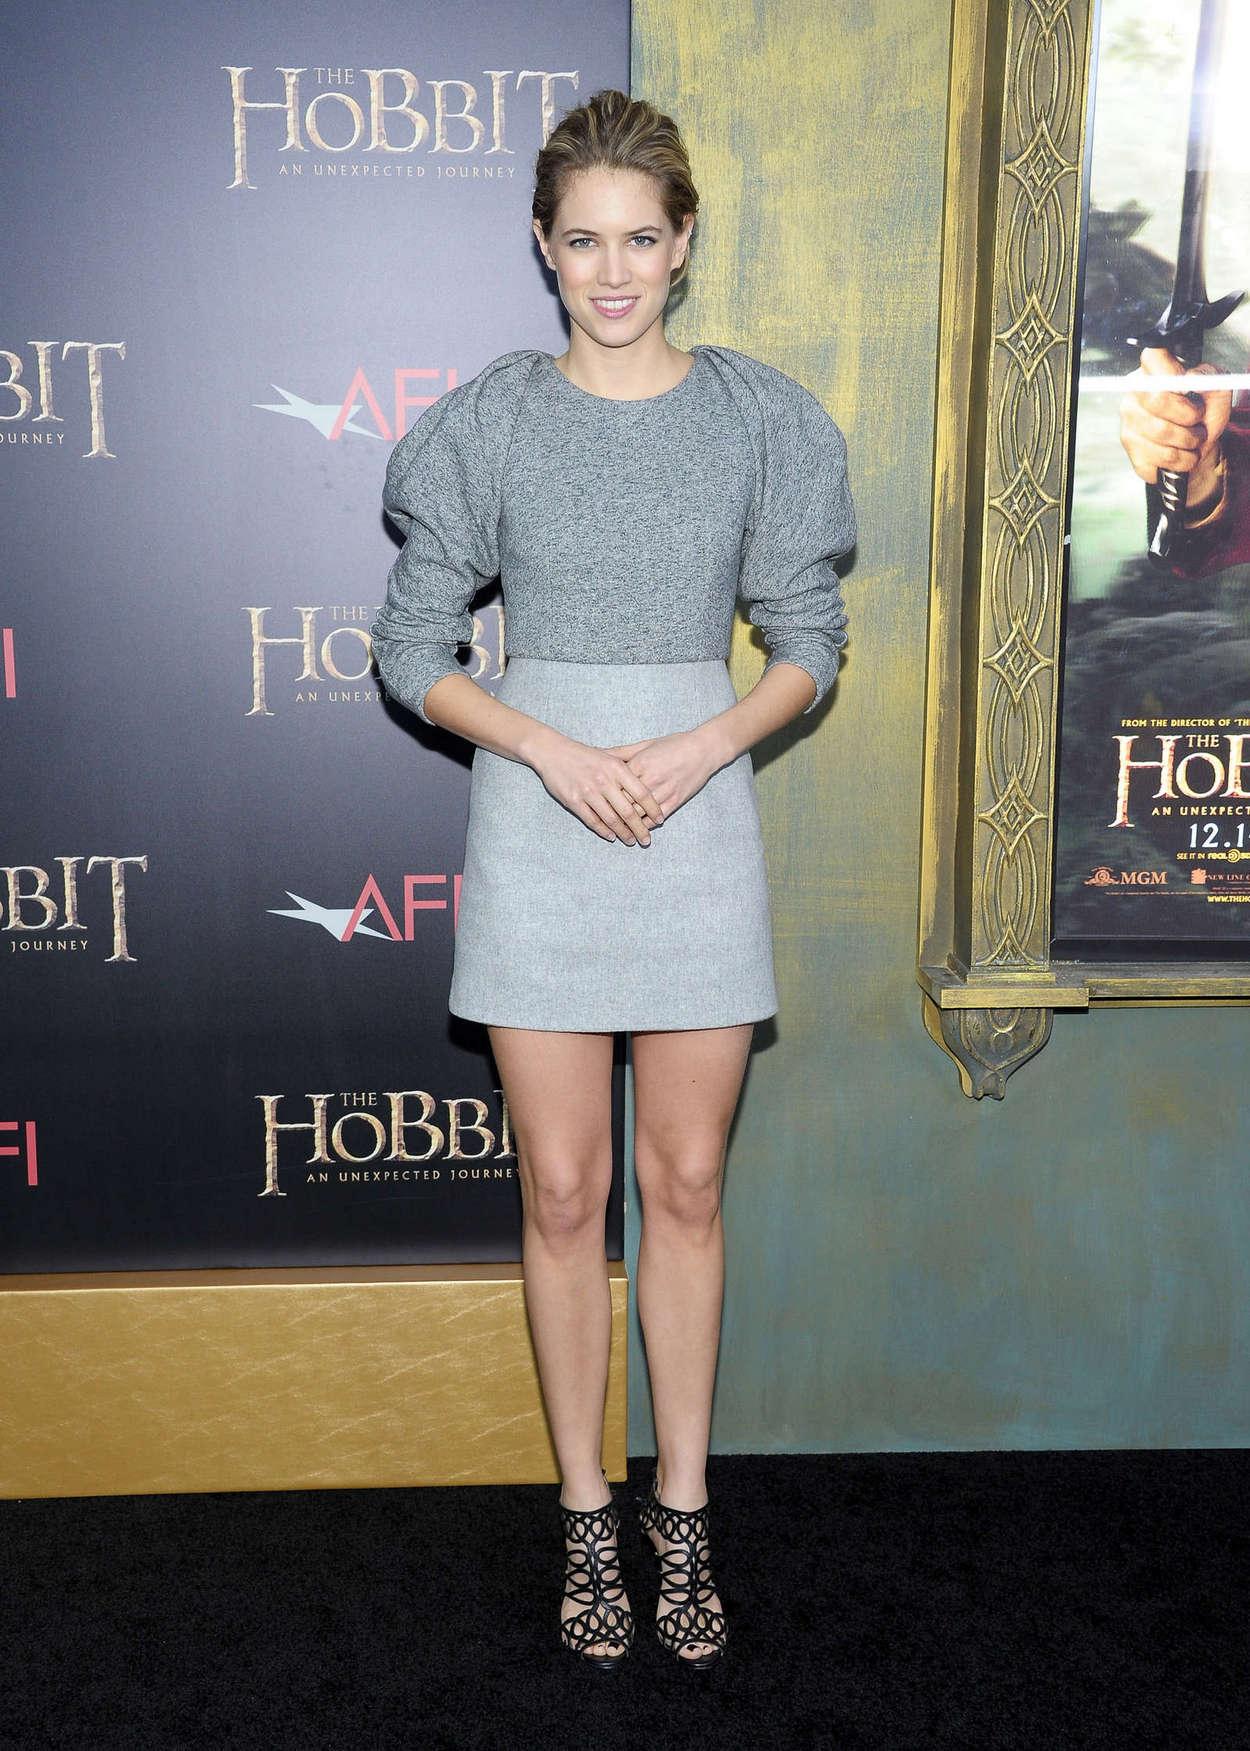 Cody Horn - The Hobbit Premiere -06 - GotCeleb Emma Watson Instagram